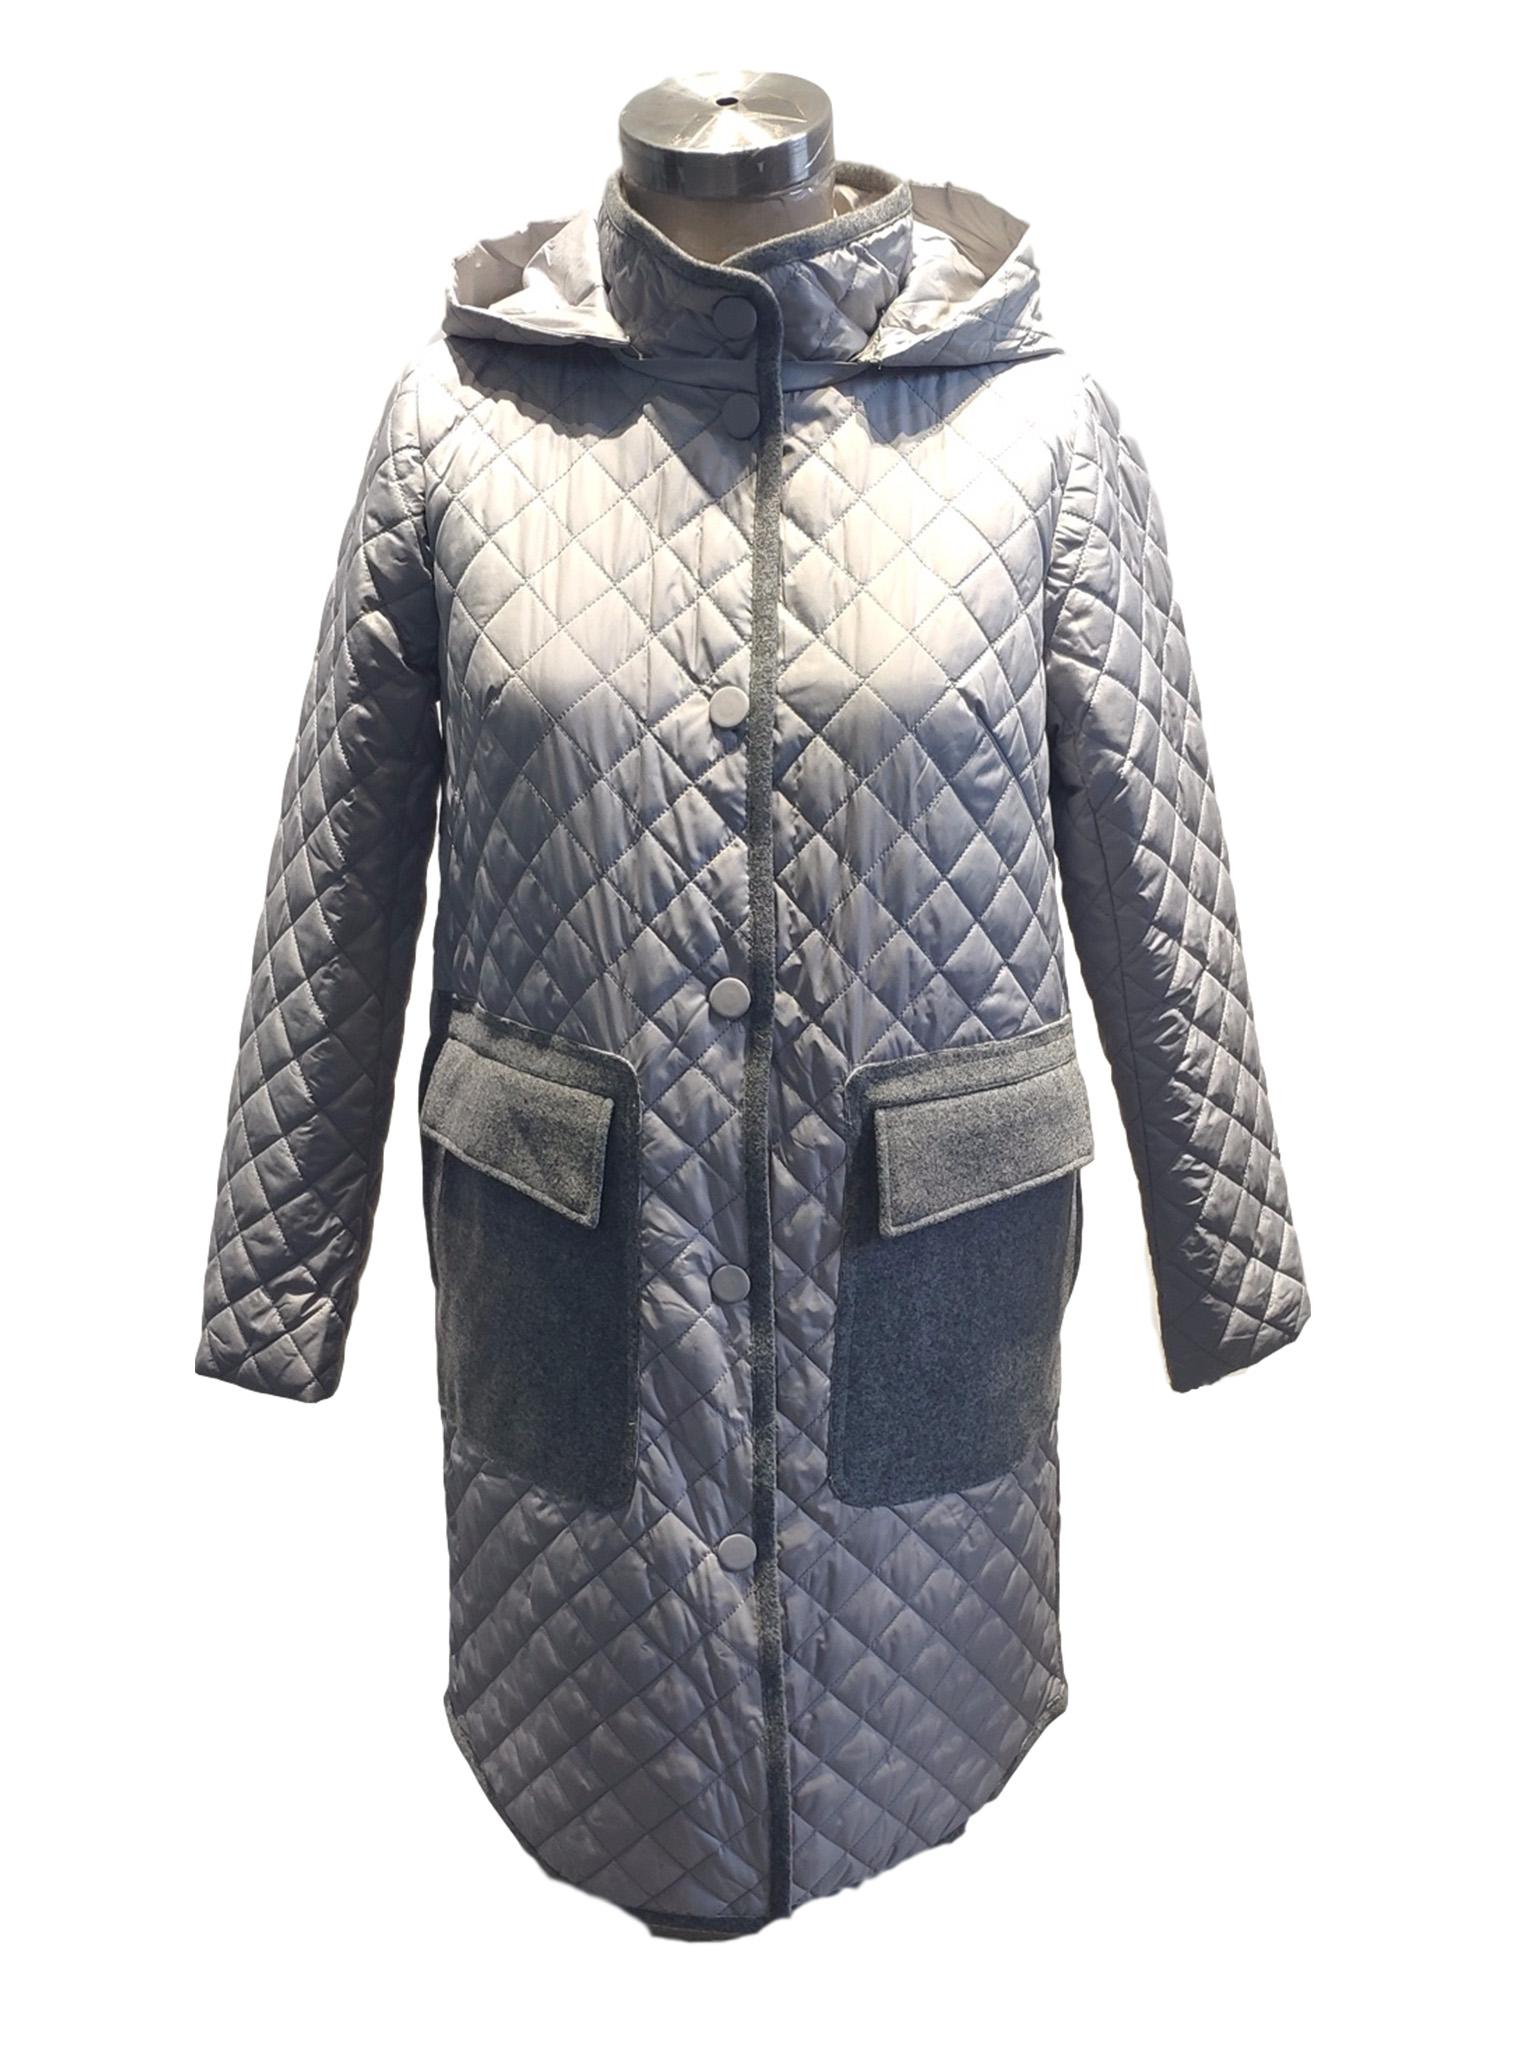 marmot down jacket cost